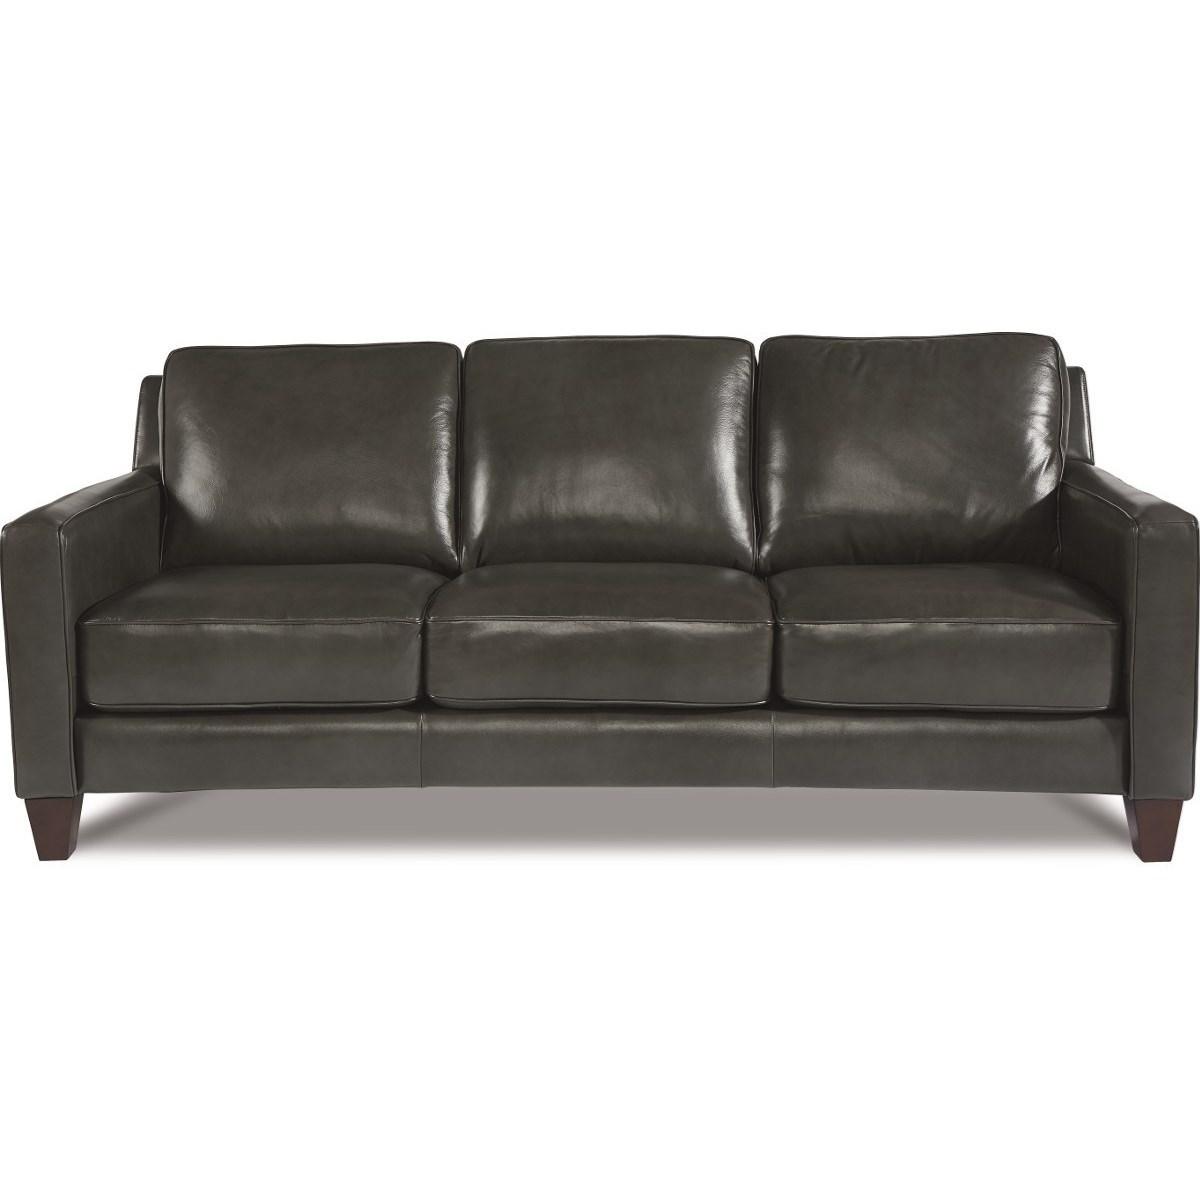 La Z Boy Archer Contemporary Leather Sofa Reid S Furniture Sofas